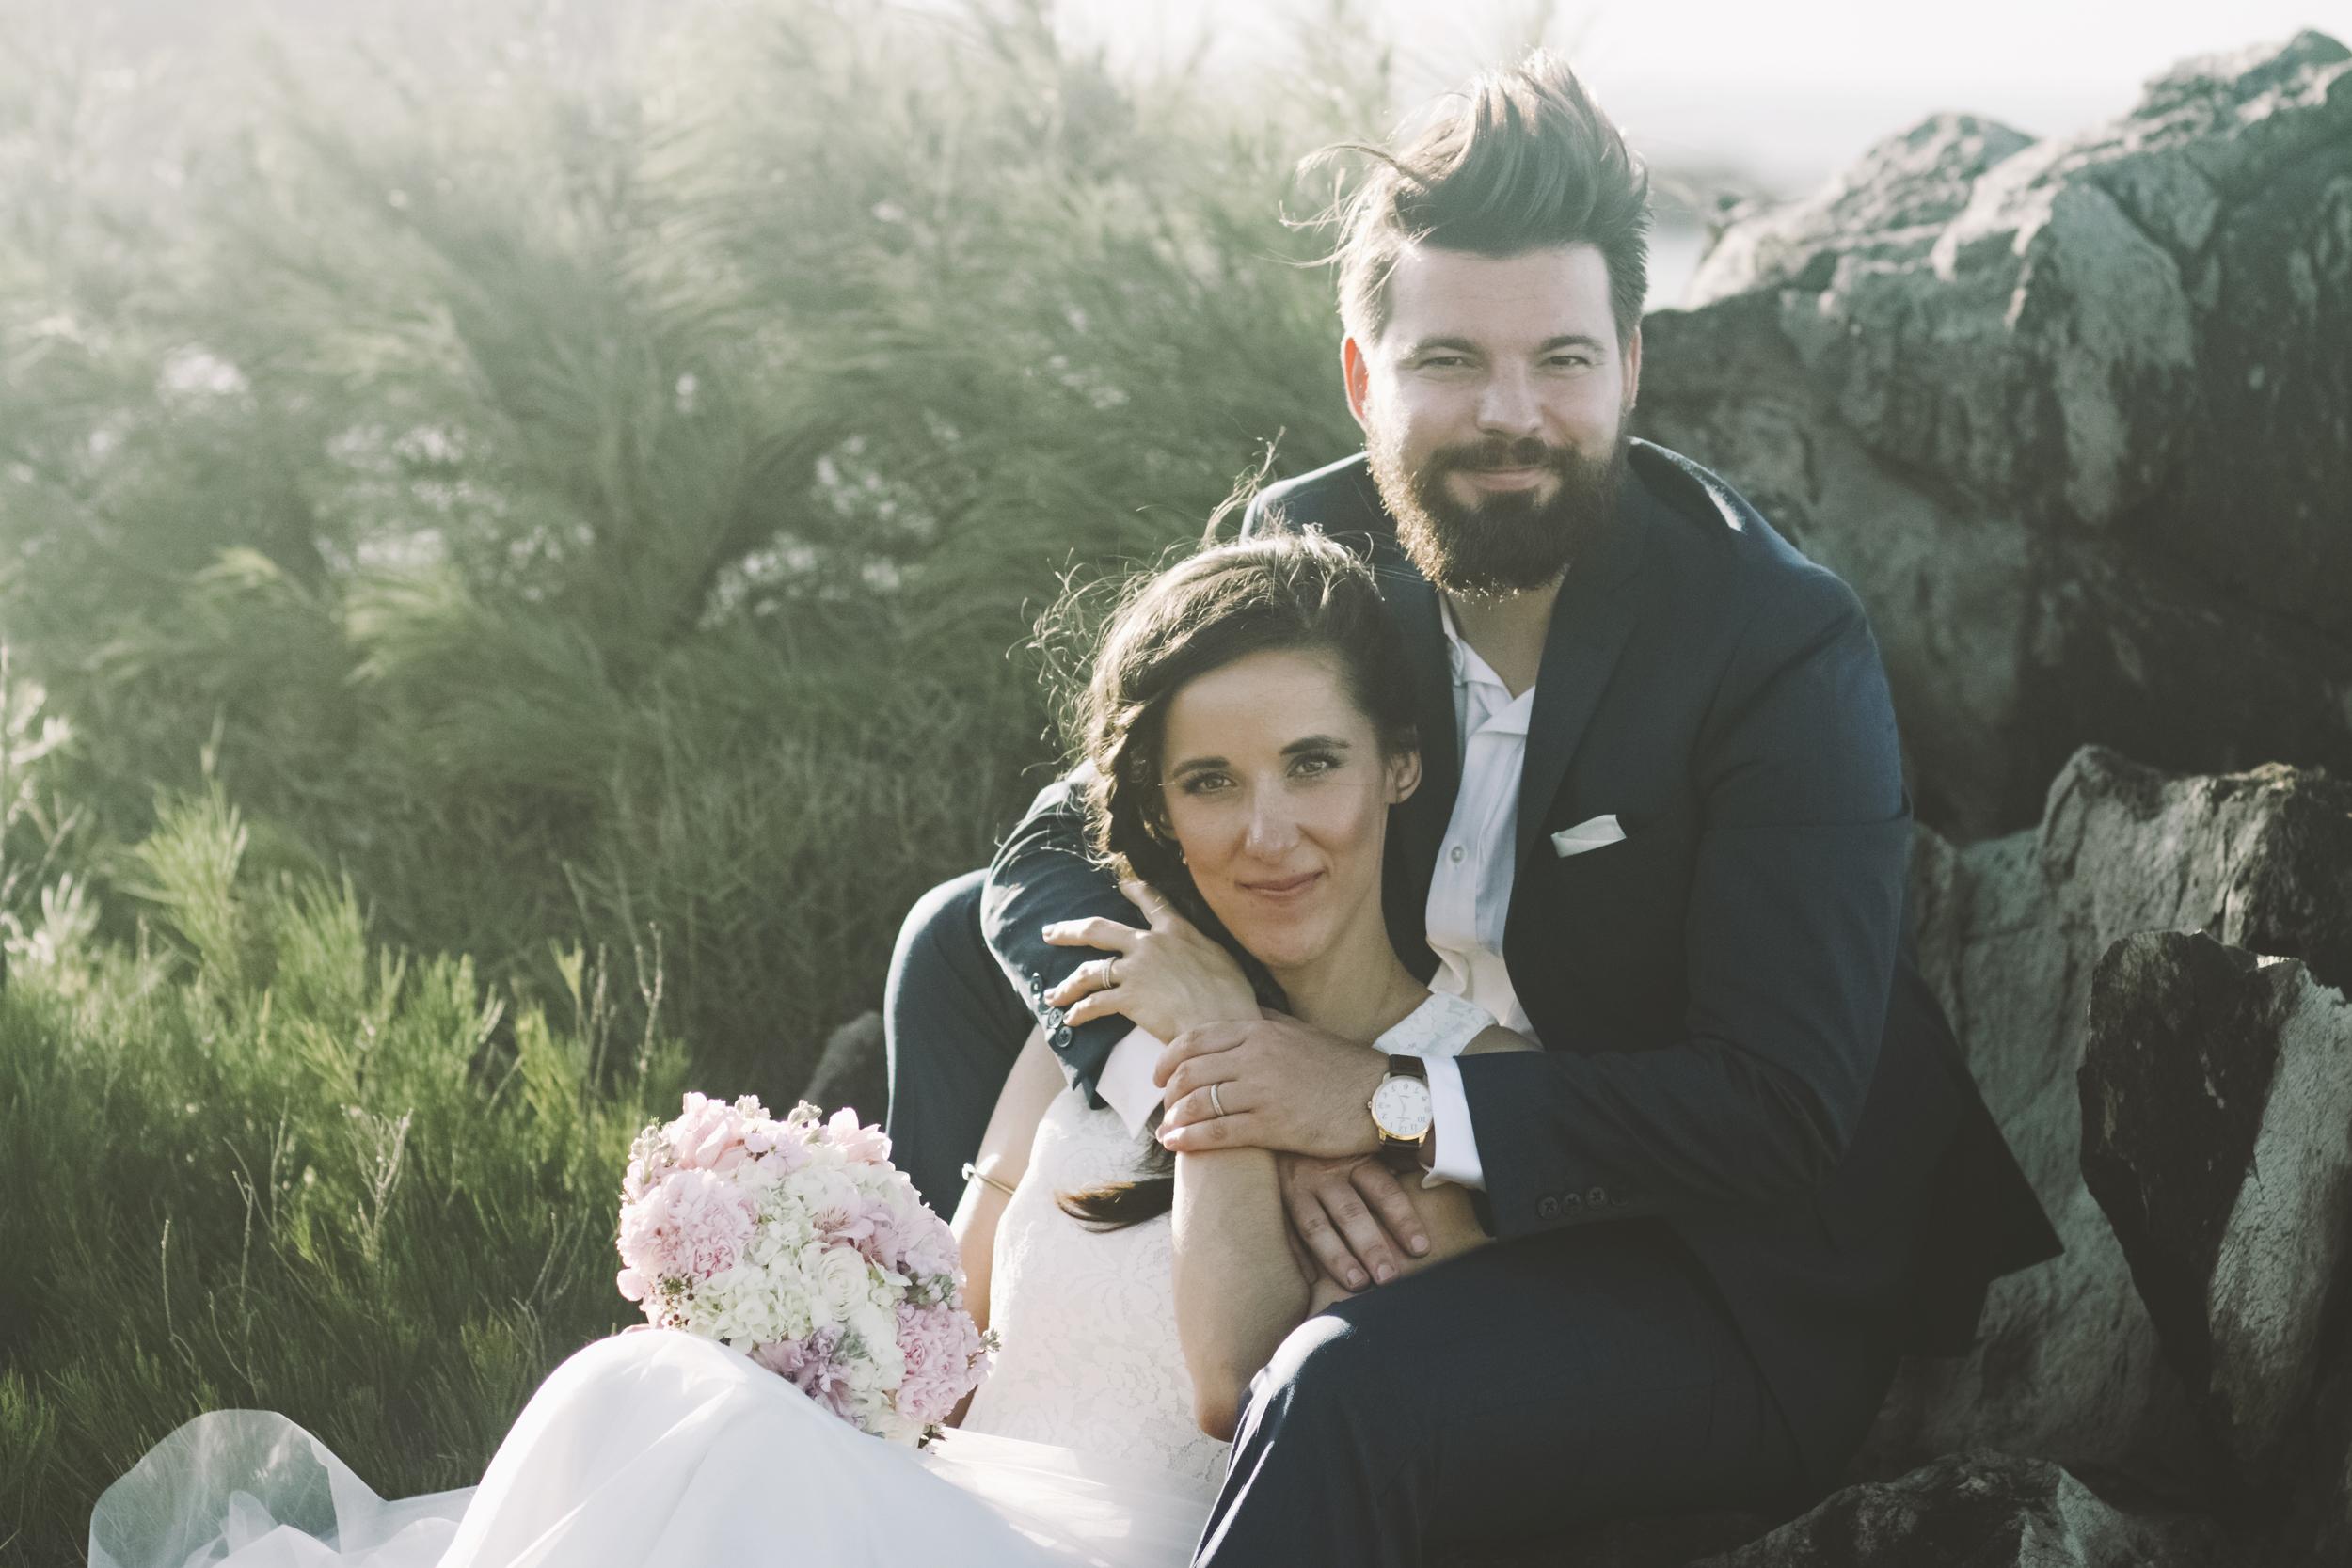 angie-diaz-photography-maui-wedding-ironwoods-beach-46.jpg